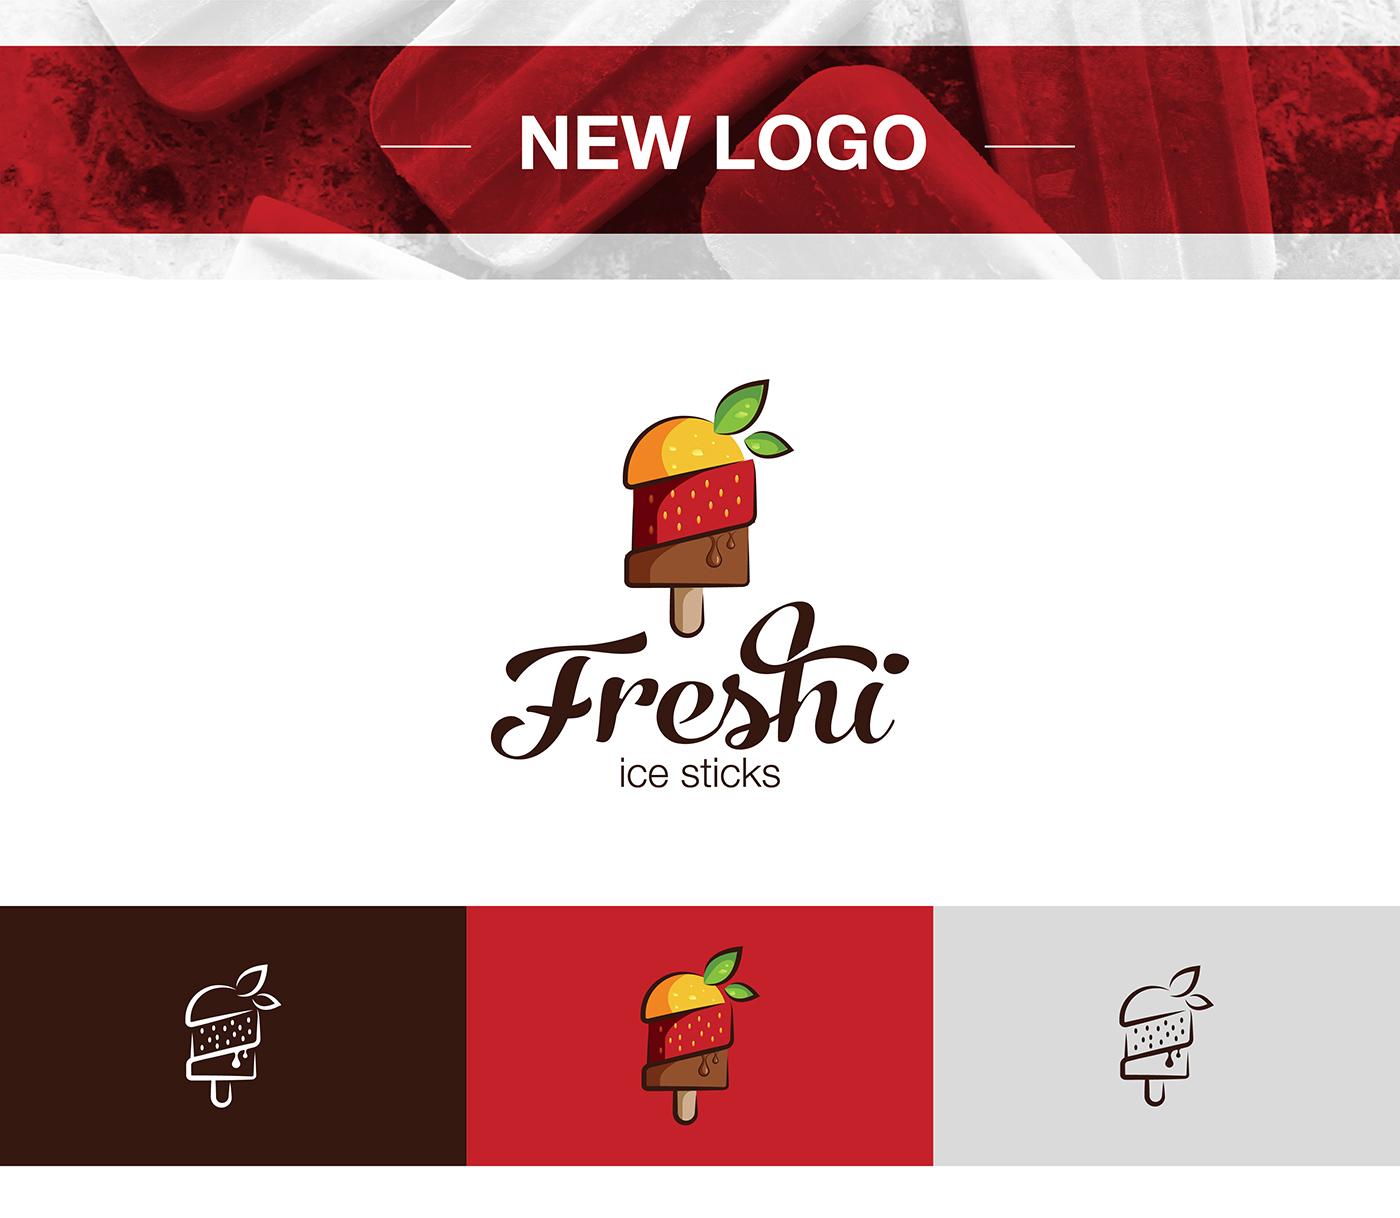 ice cream ice sticks Freshi creative logo colorful Brandinc brandinc. fresh facelift rebranding